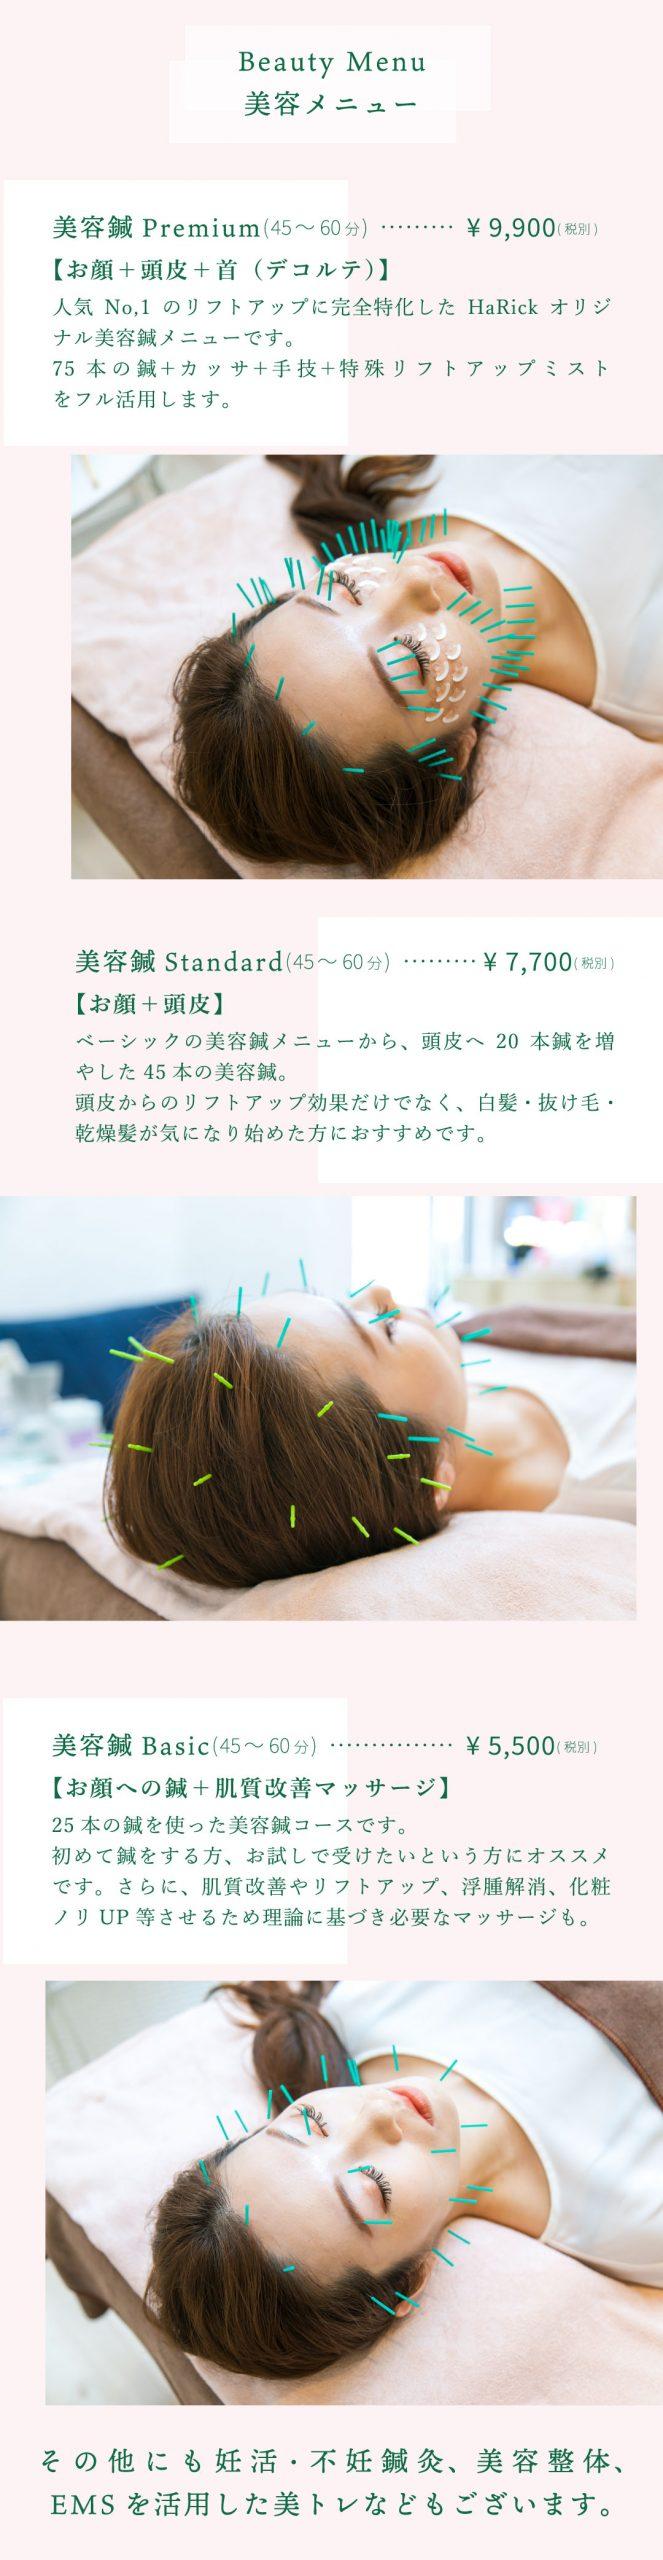 HaRick美容鍼灸整体のメニュー